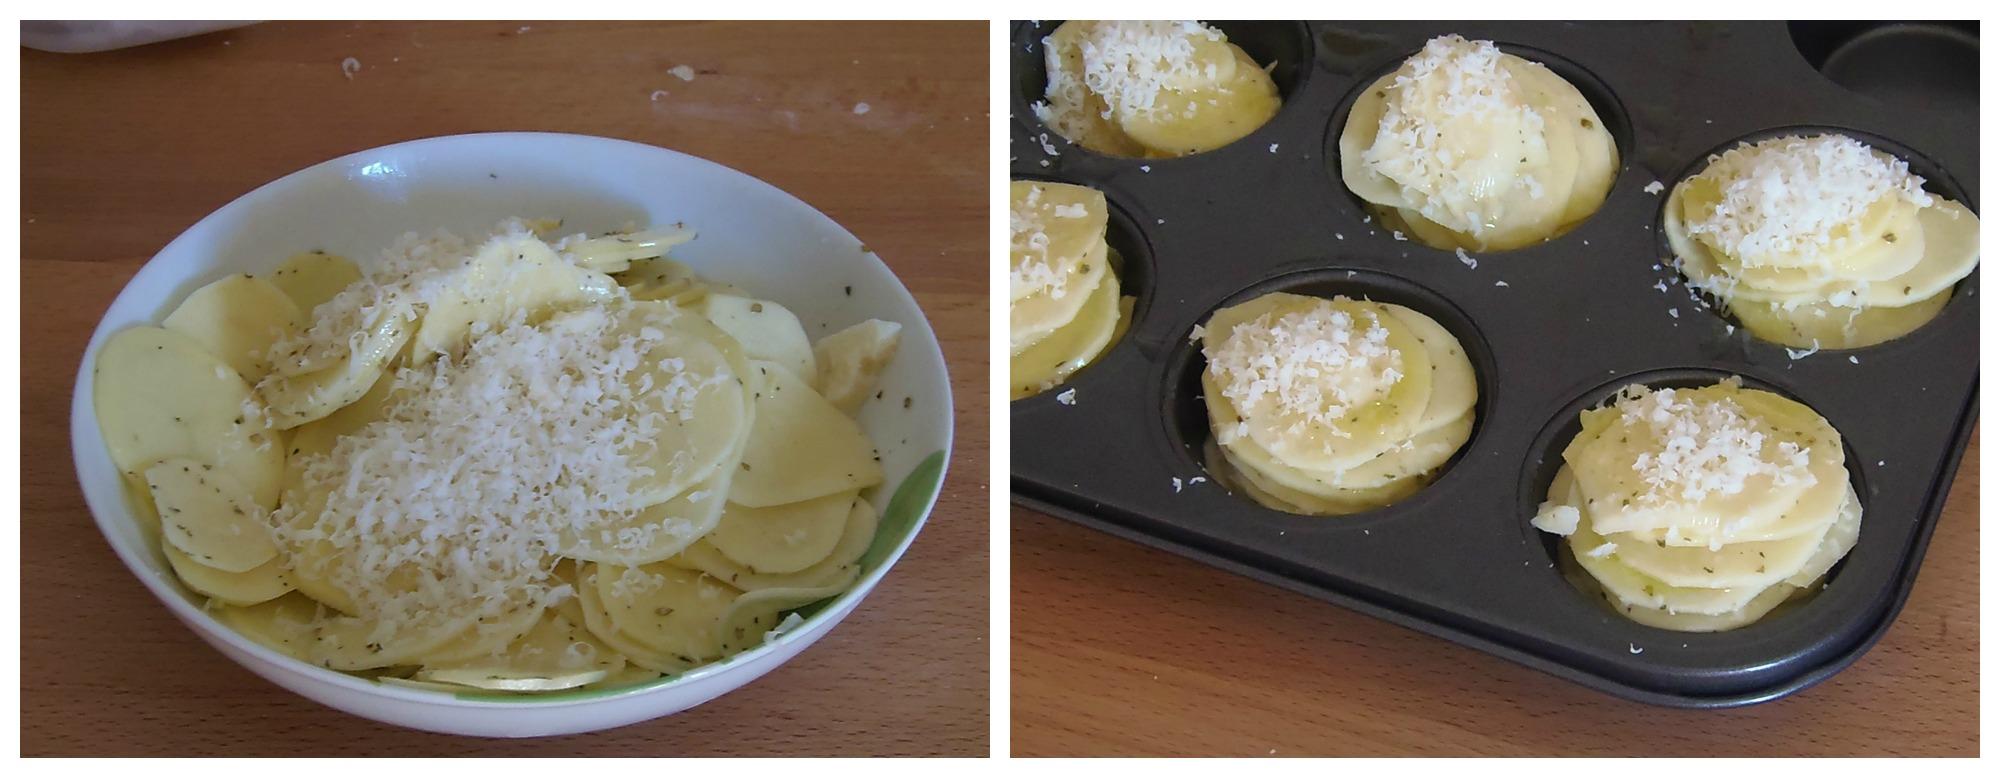 Rose di patate 1 ingrediente principale